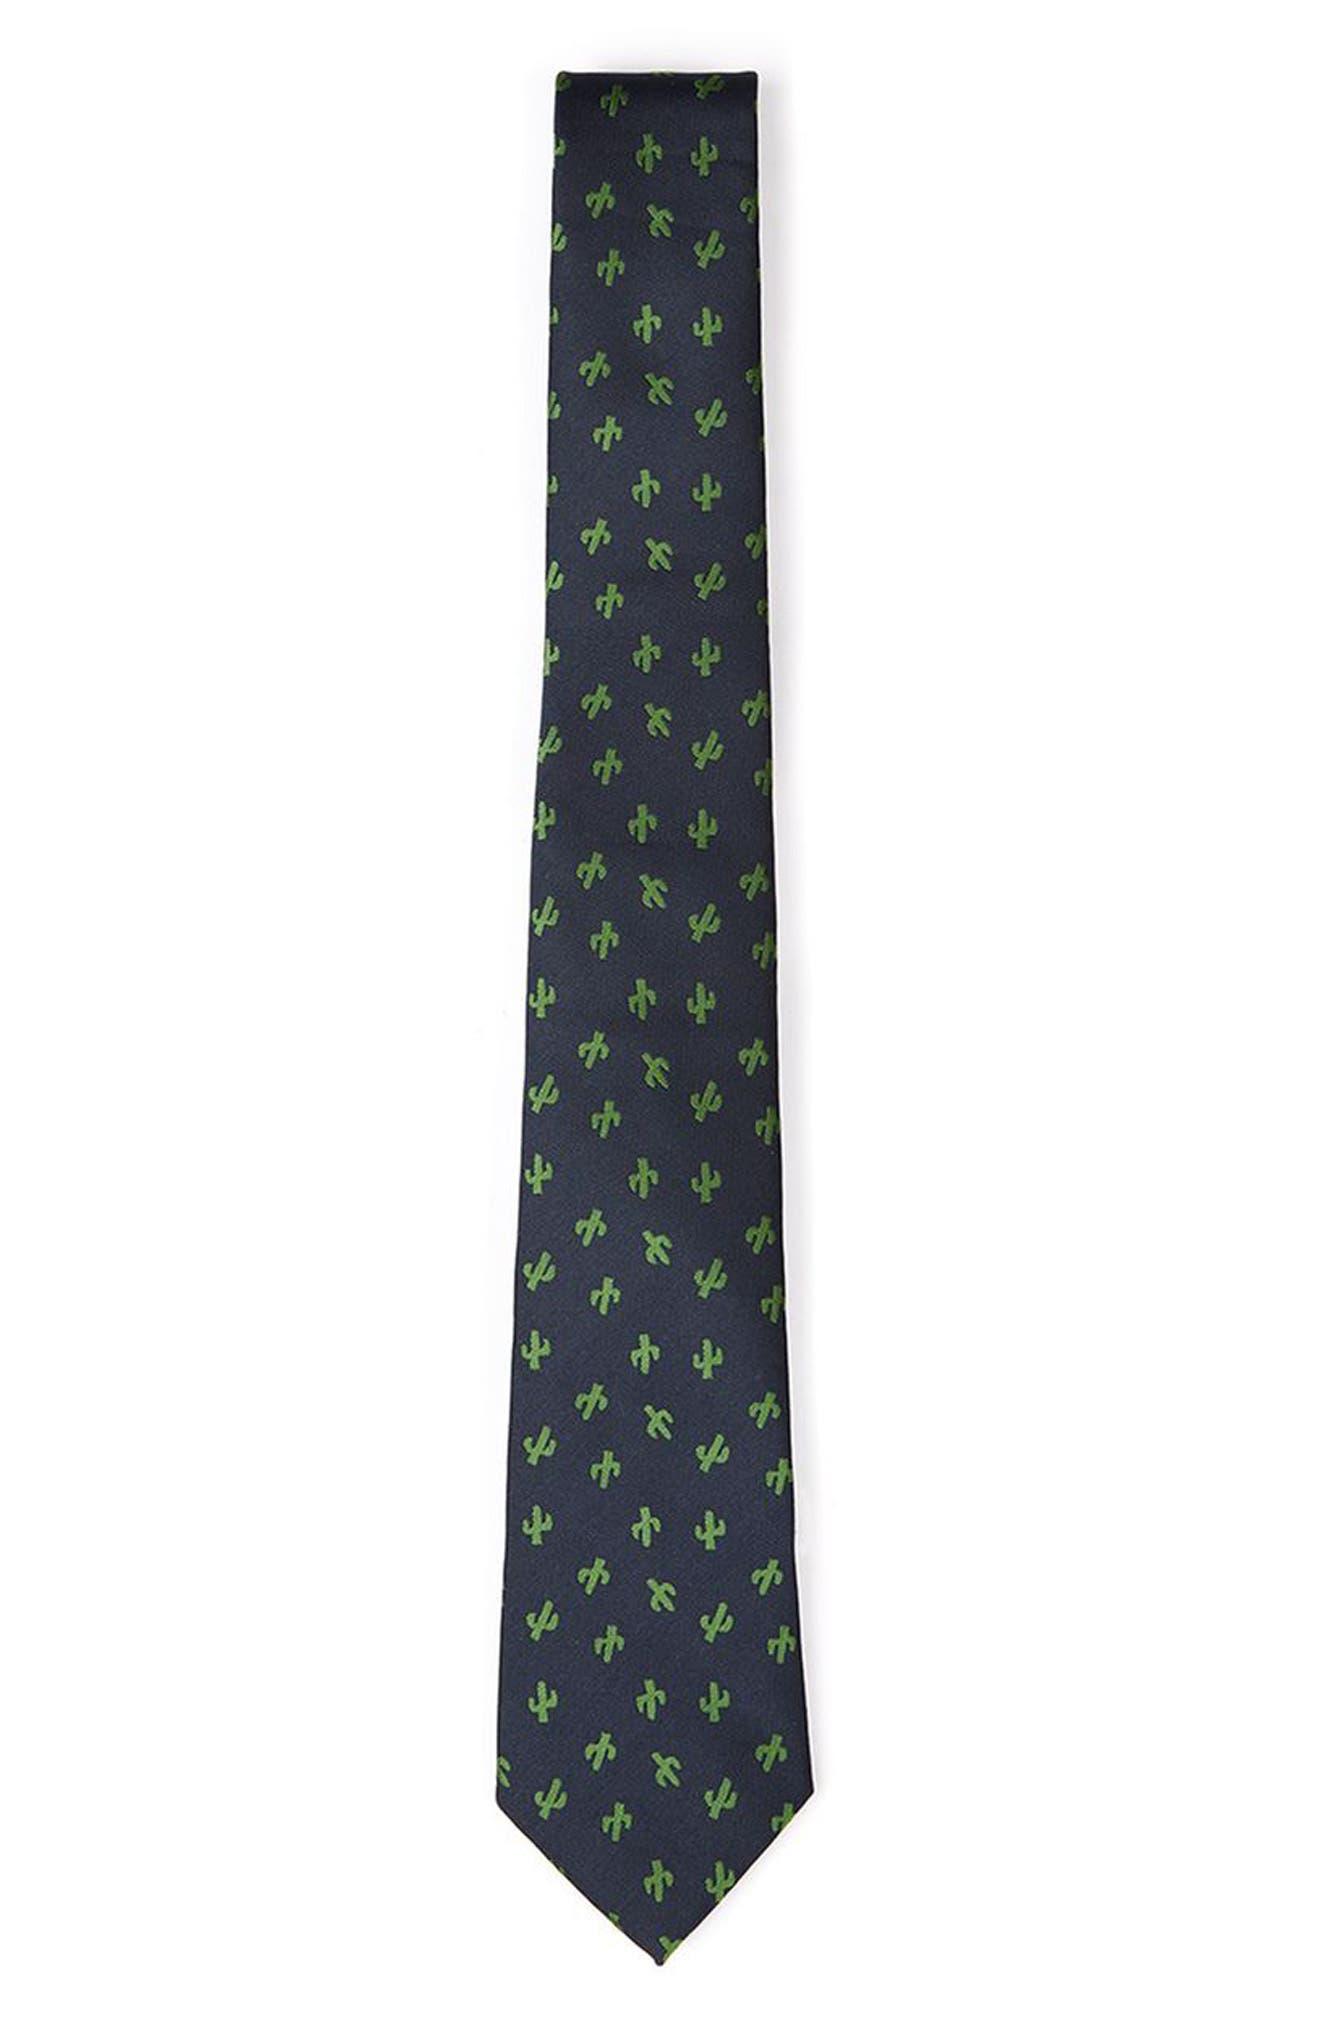 Topman Cactus Print Tie